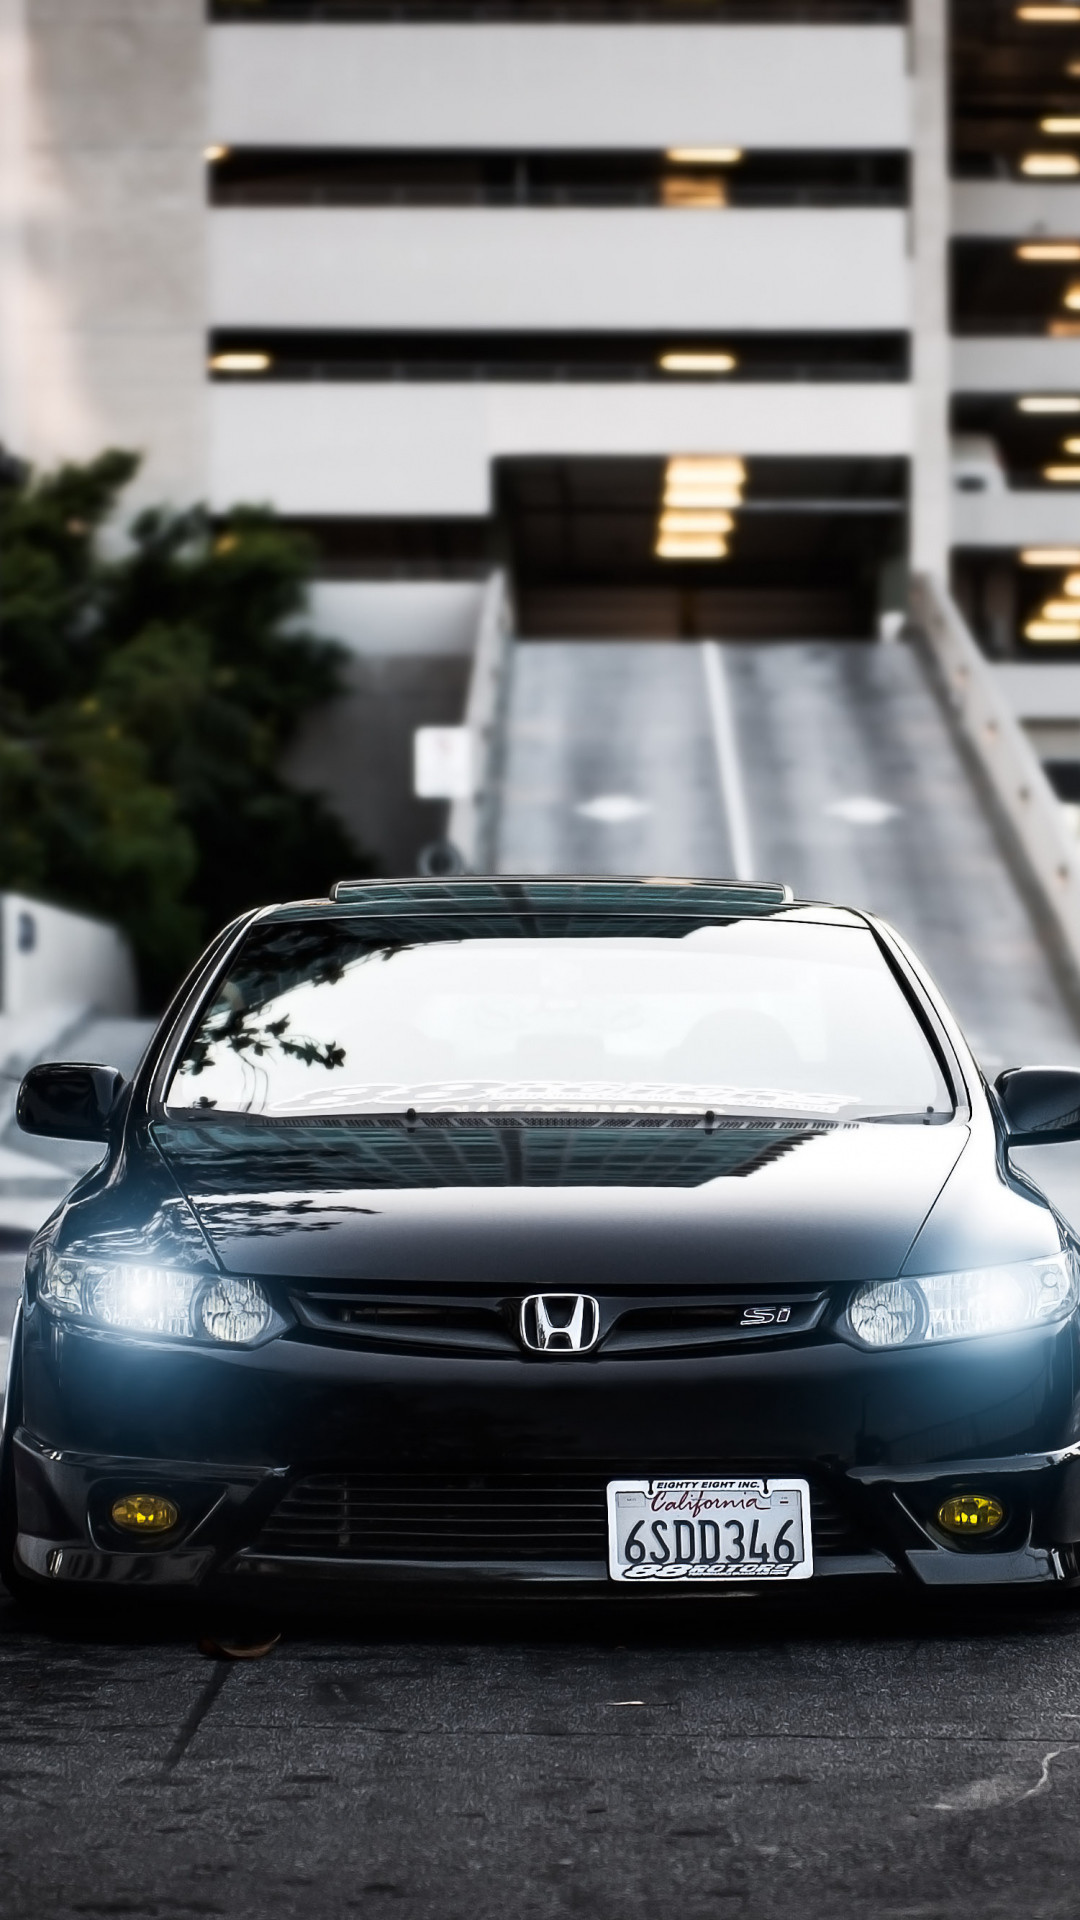 Honda Civic Si Wallpaper 52 Images